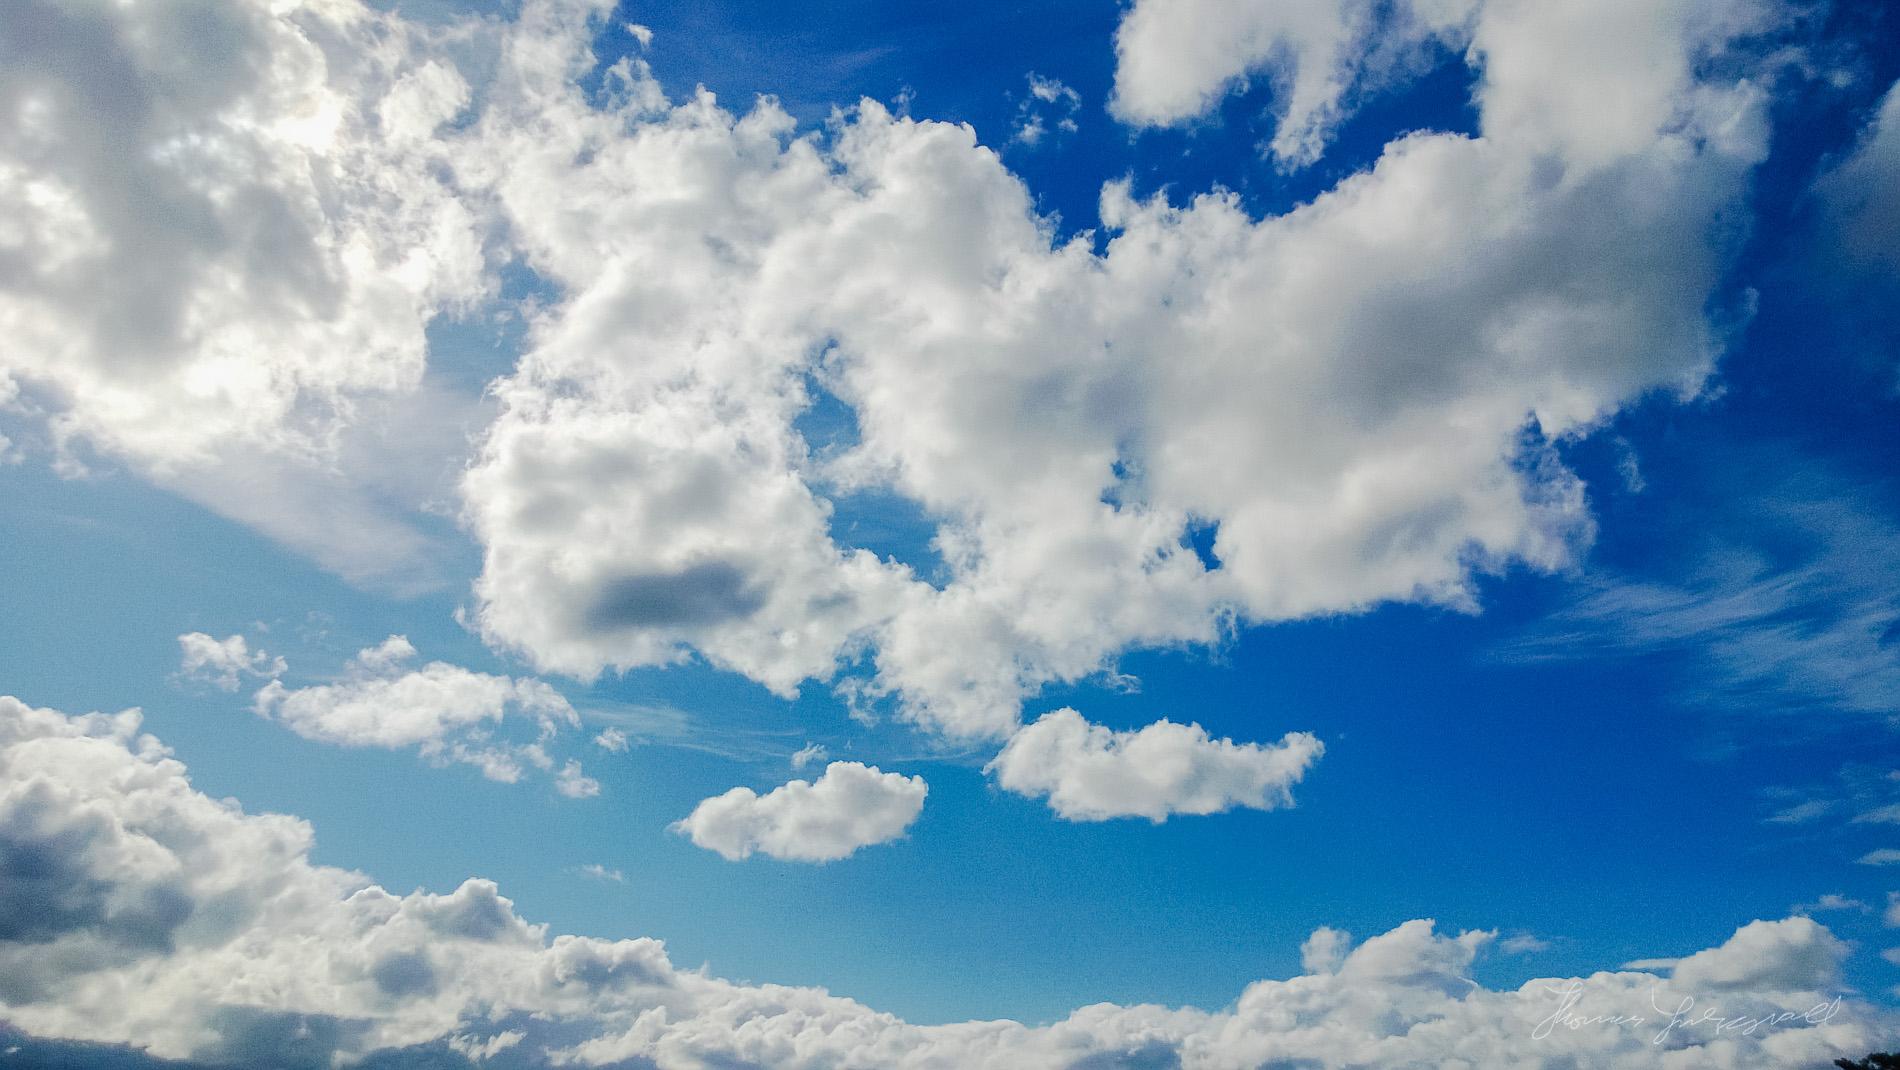 Sky, Nokia Lumia 920